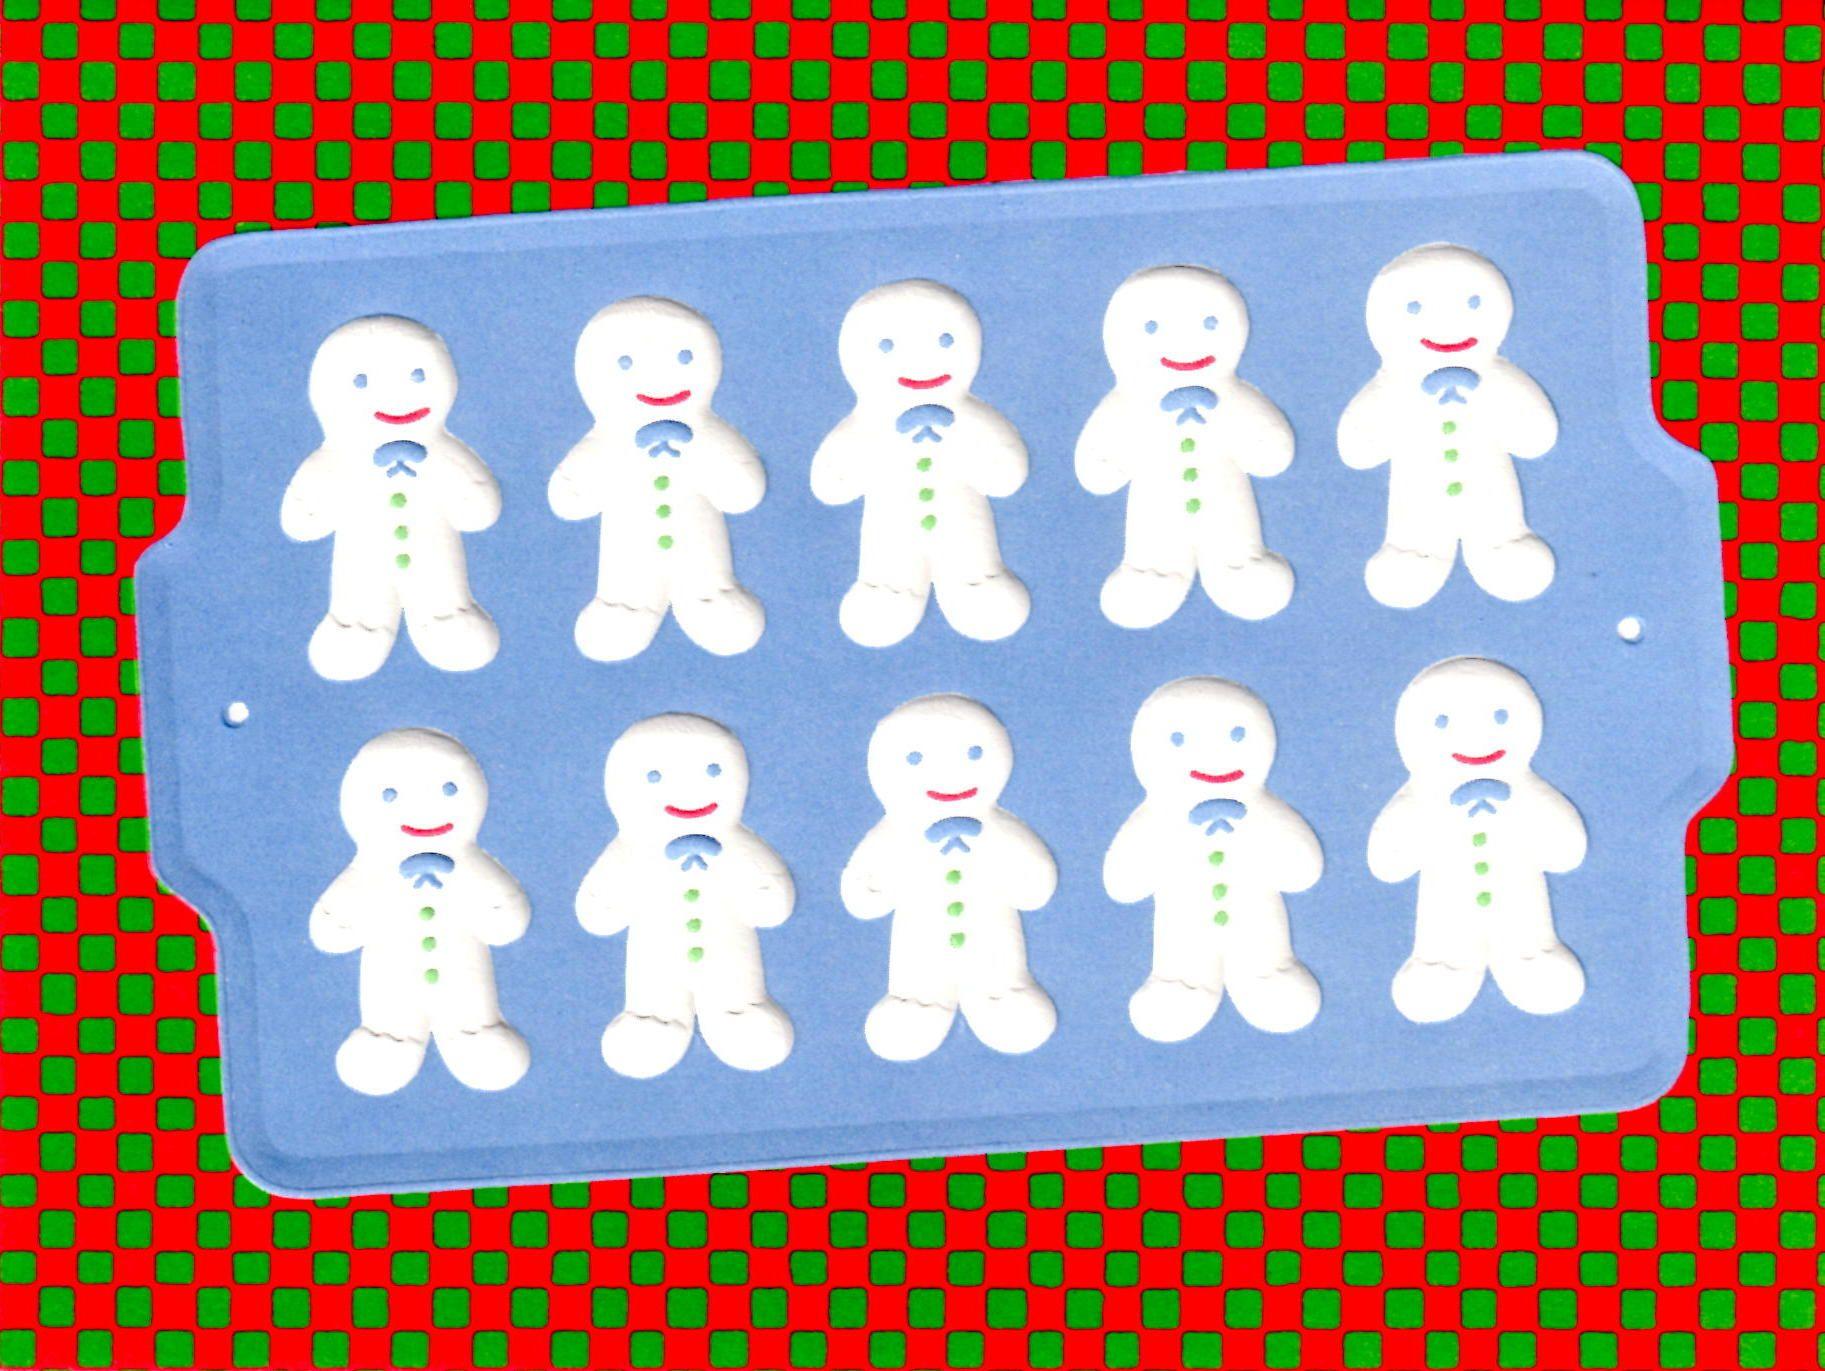 Curtis Swann embossed Christmas card Gingerbread Men on Cookie Sheet